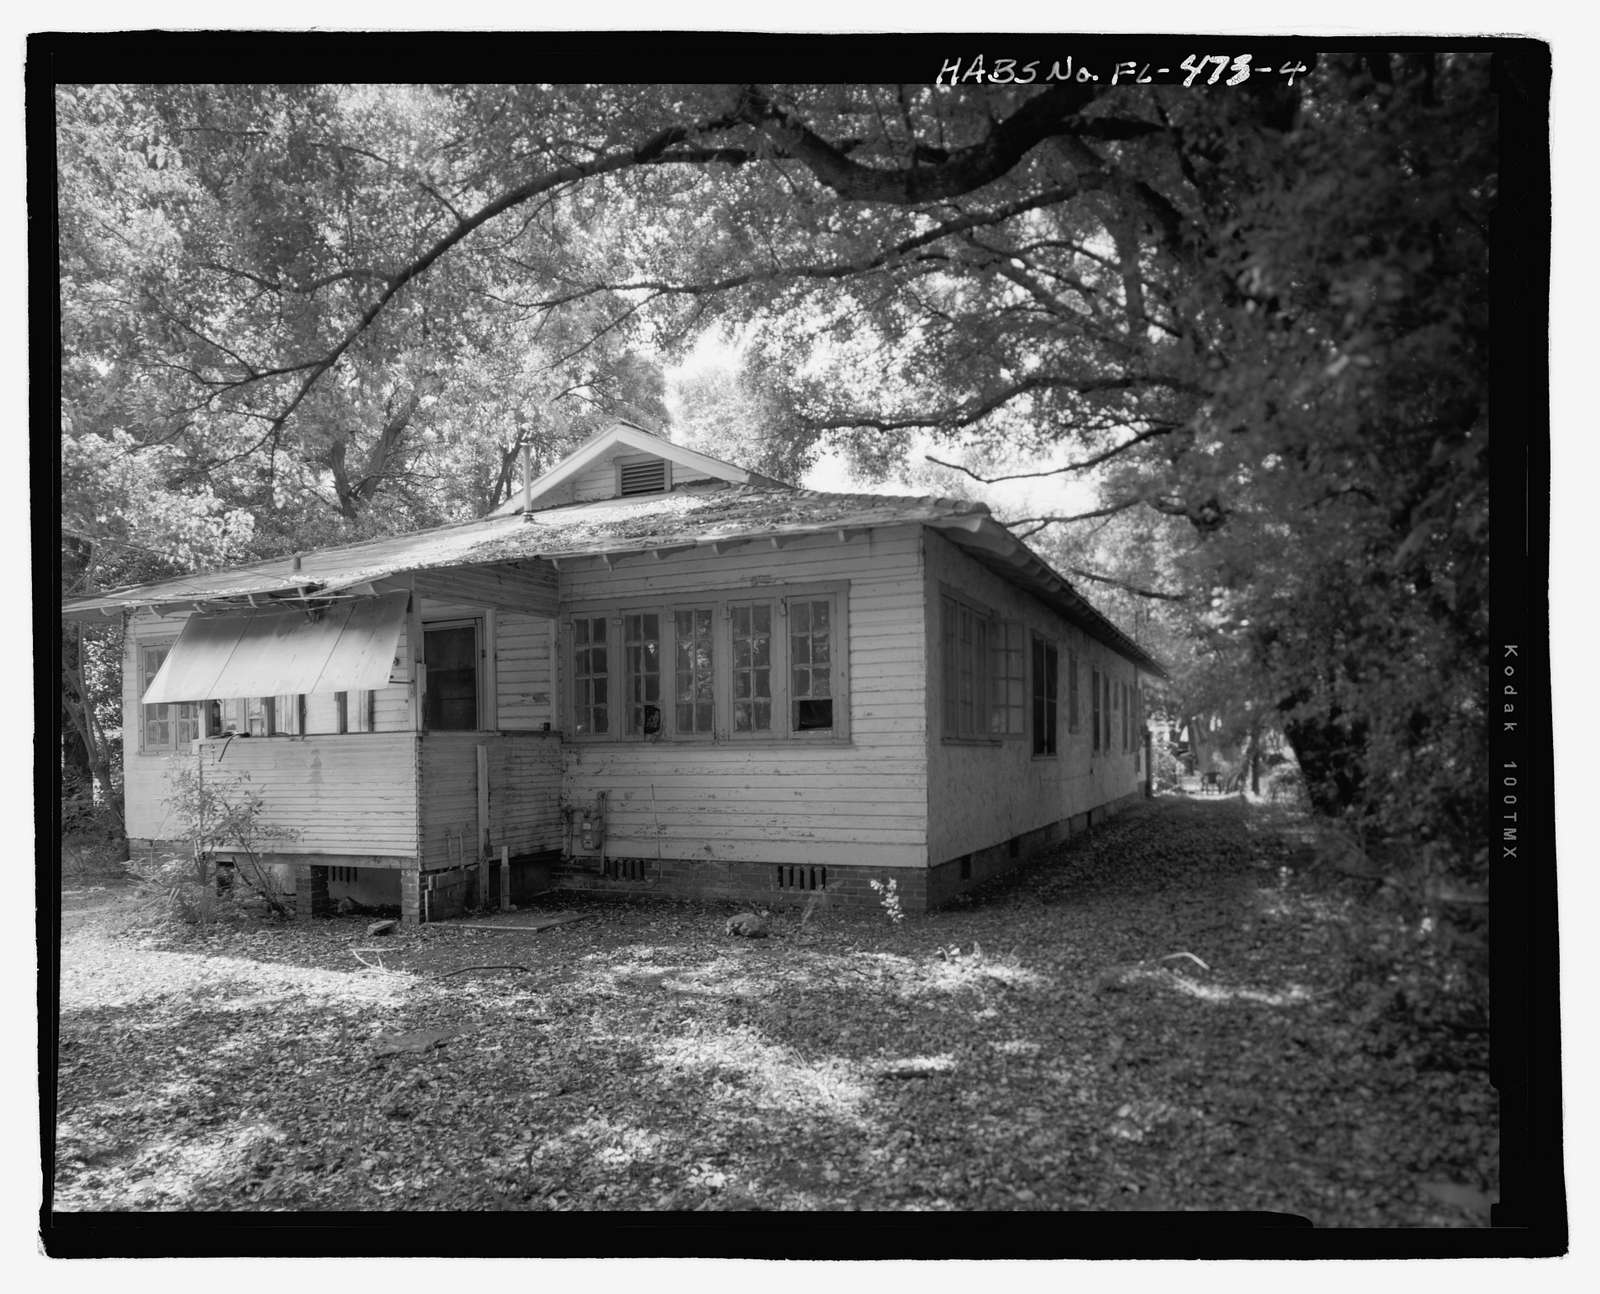 606 East Frances Street (House), Tampa, Hillsborough County, FL